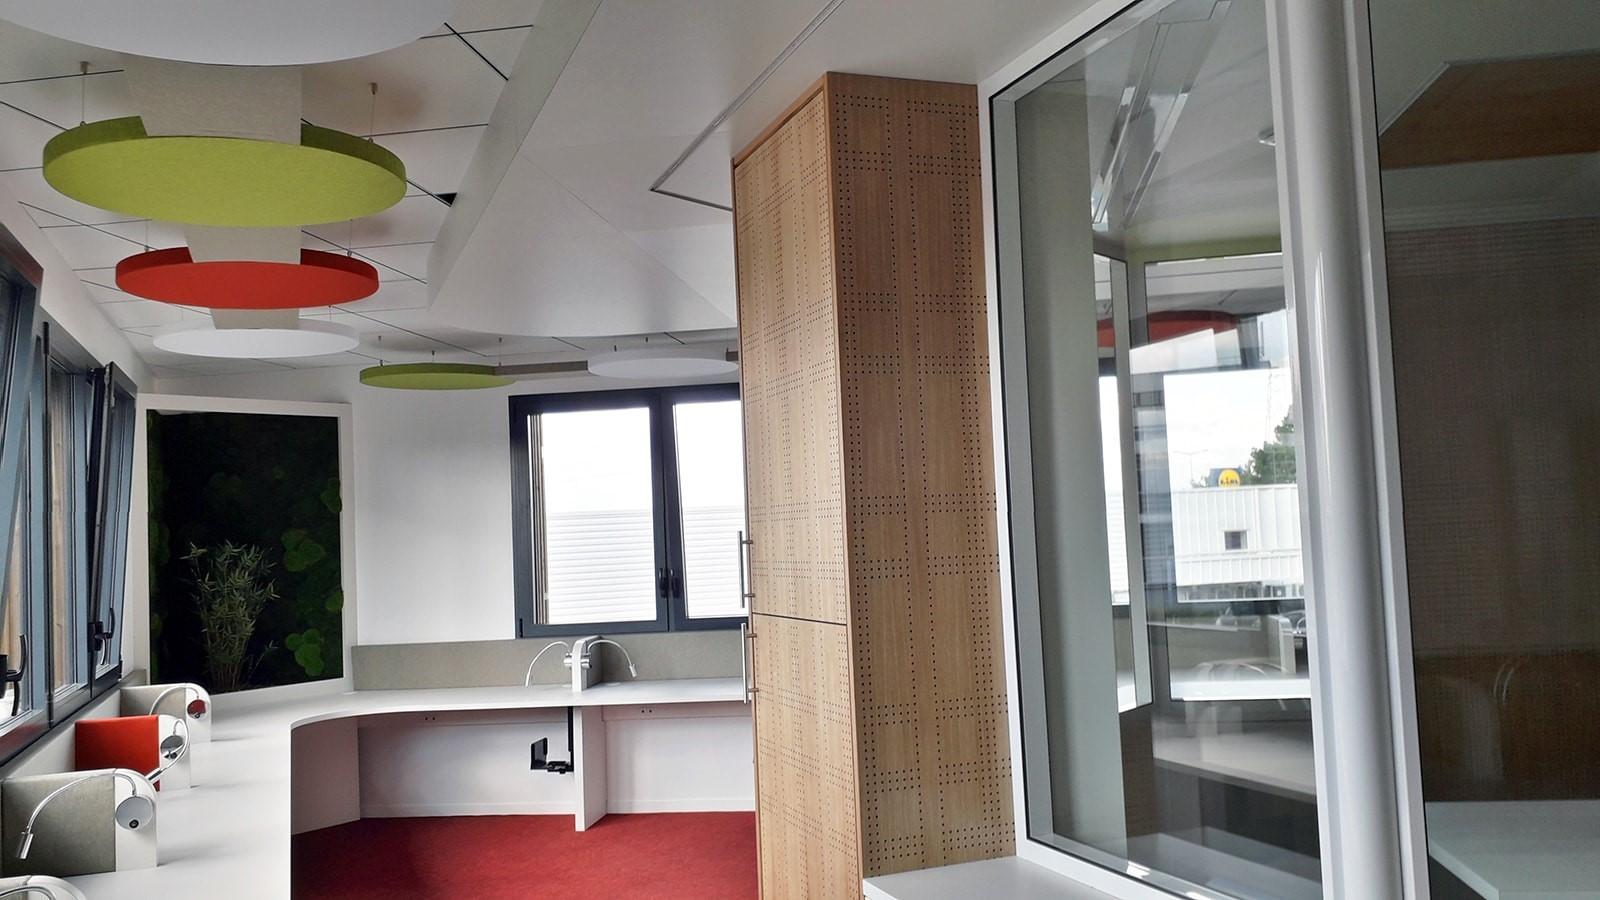 Bureaux Had Cholet Efi Design (2)